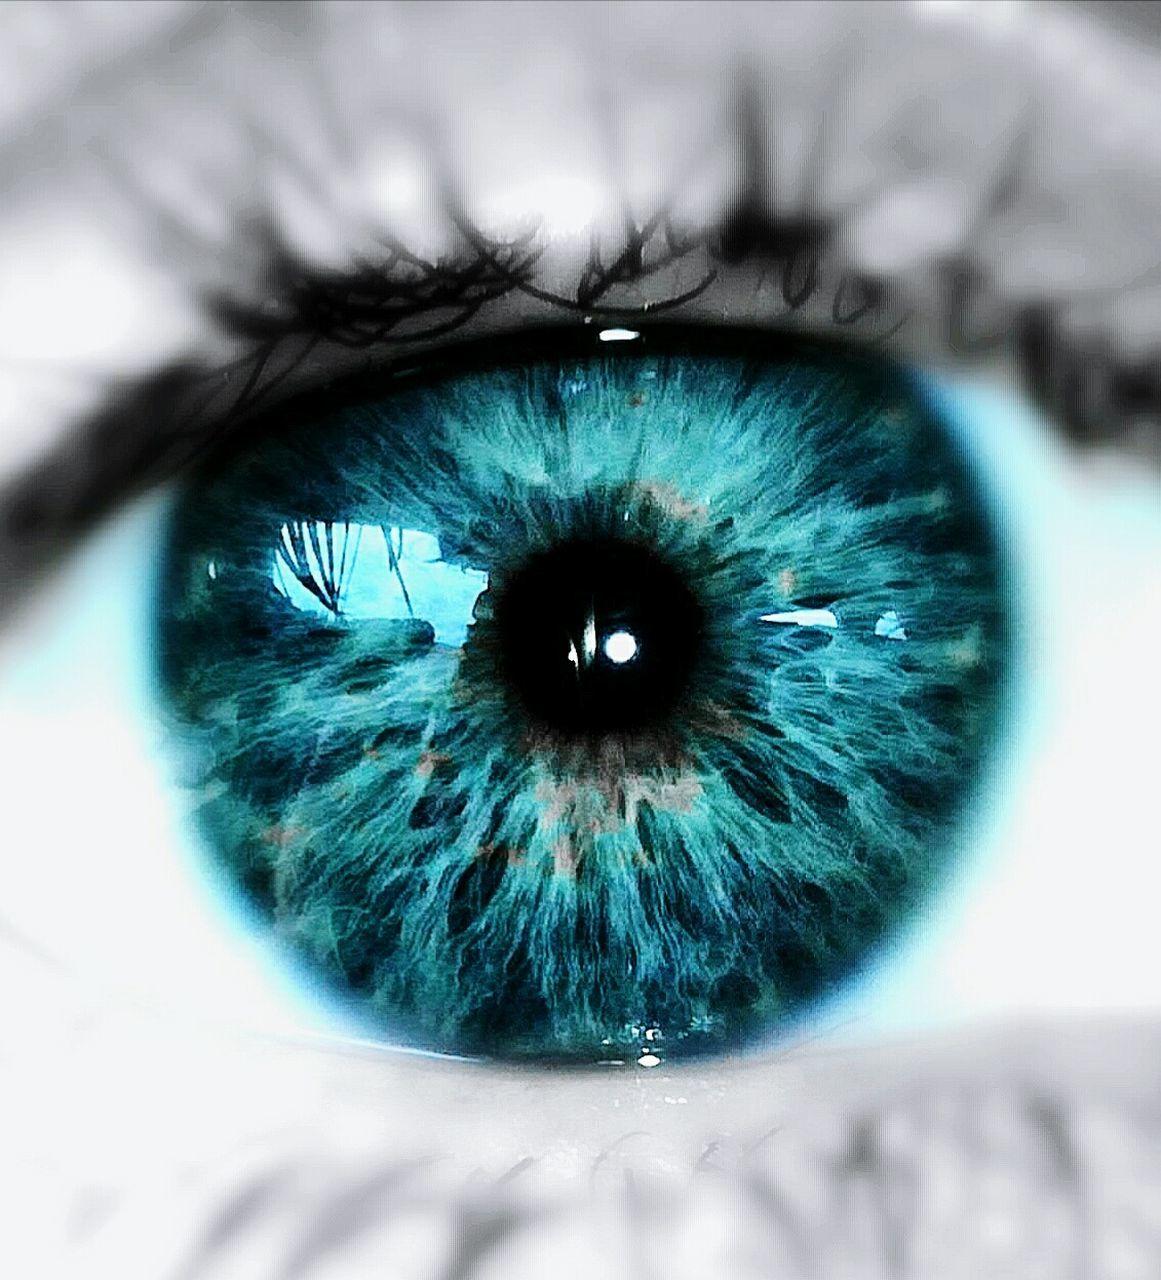 human eye, eyelash, blue, human body part, sensory perception, one person, eyeball, real people, iris - eye, close-up, eyesight, looking at camera, day, indoors, people